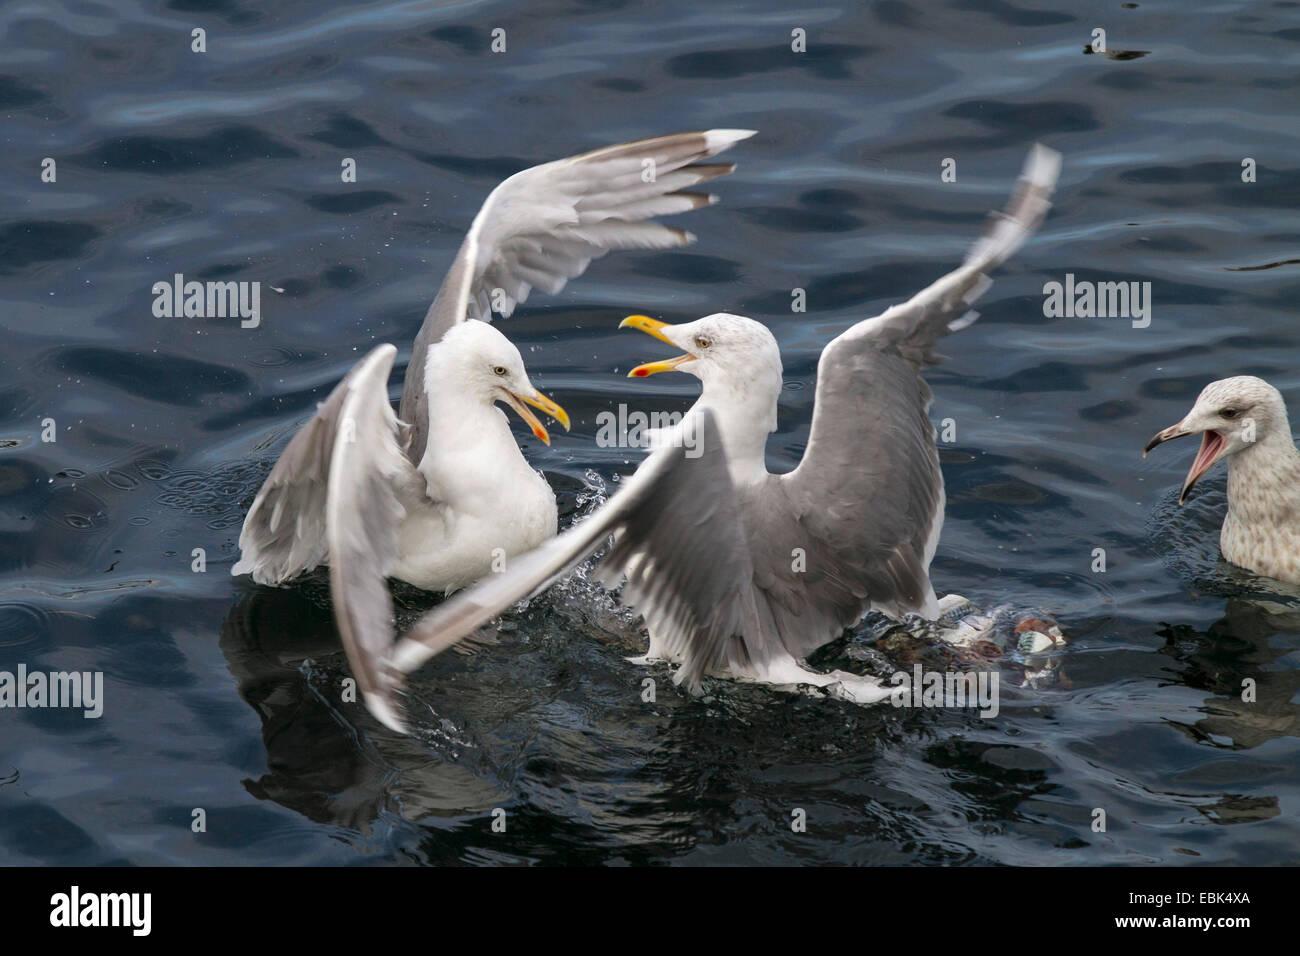 herring gull (Larus argentatus), three birds fighting for prey in the water, Norway, Hitra - Stock Image